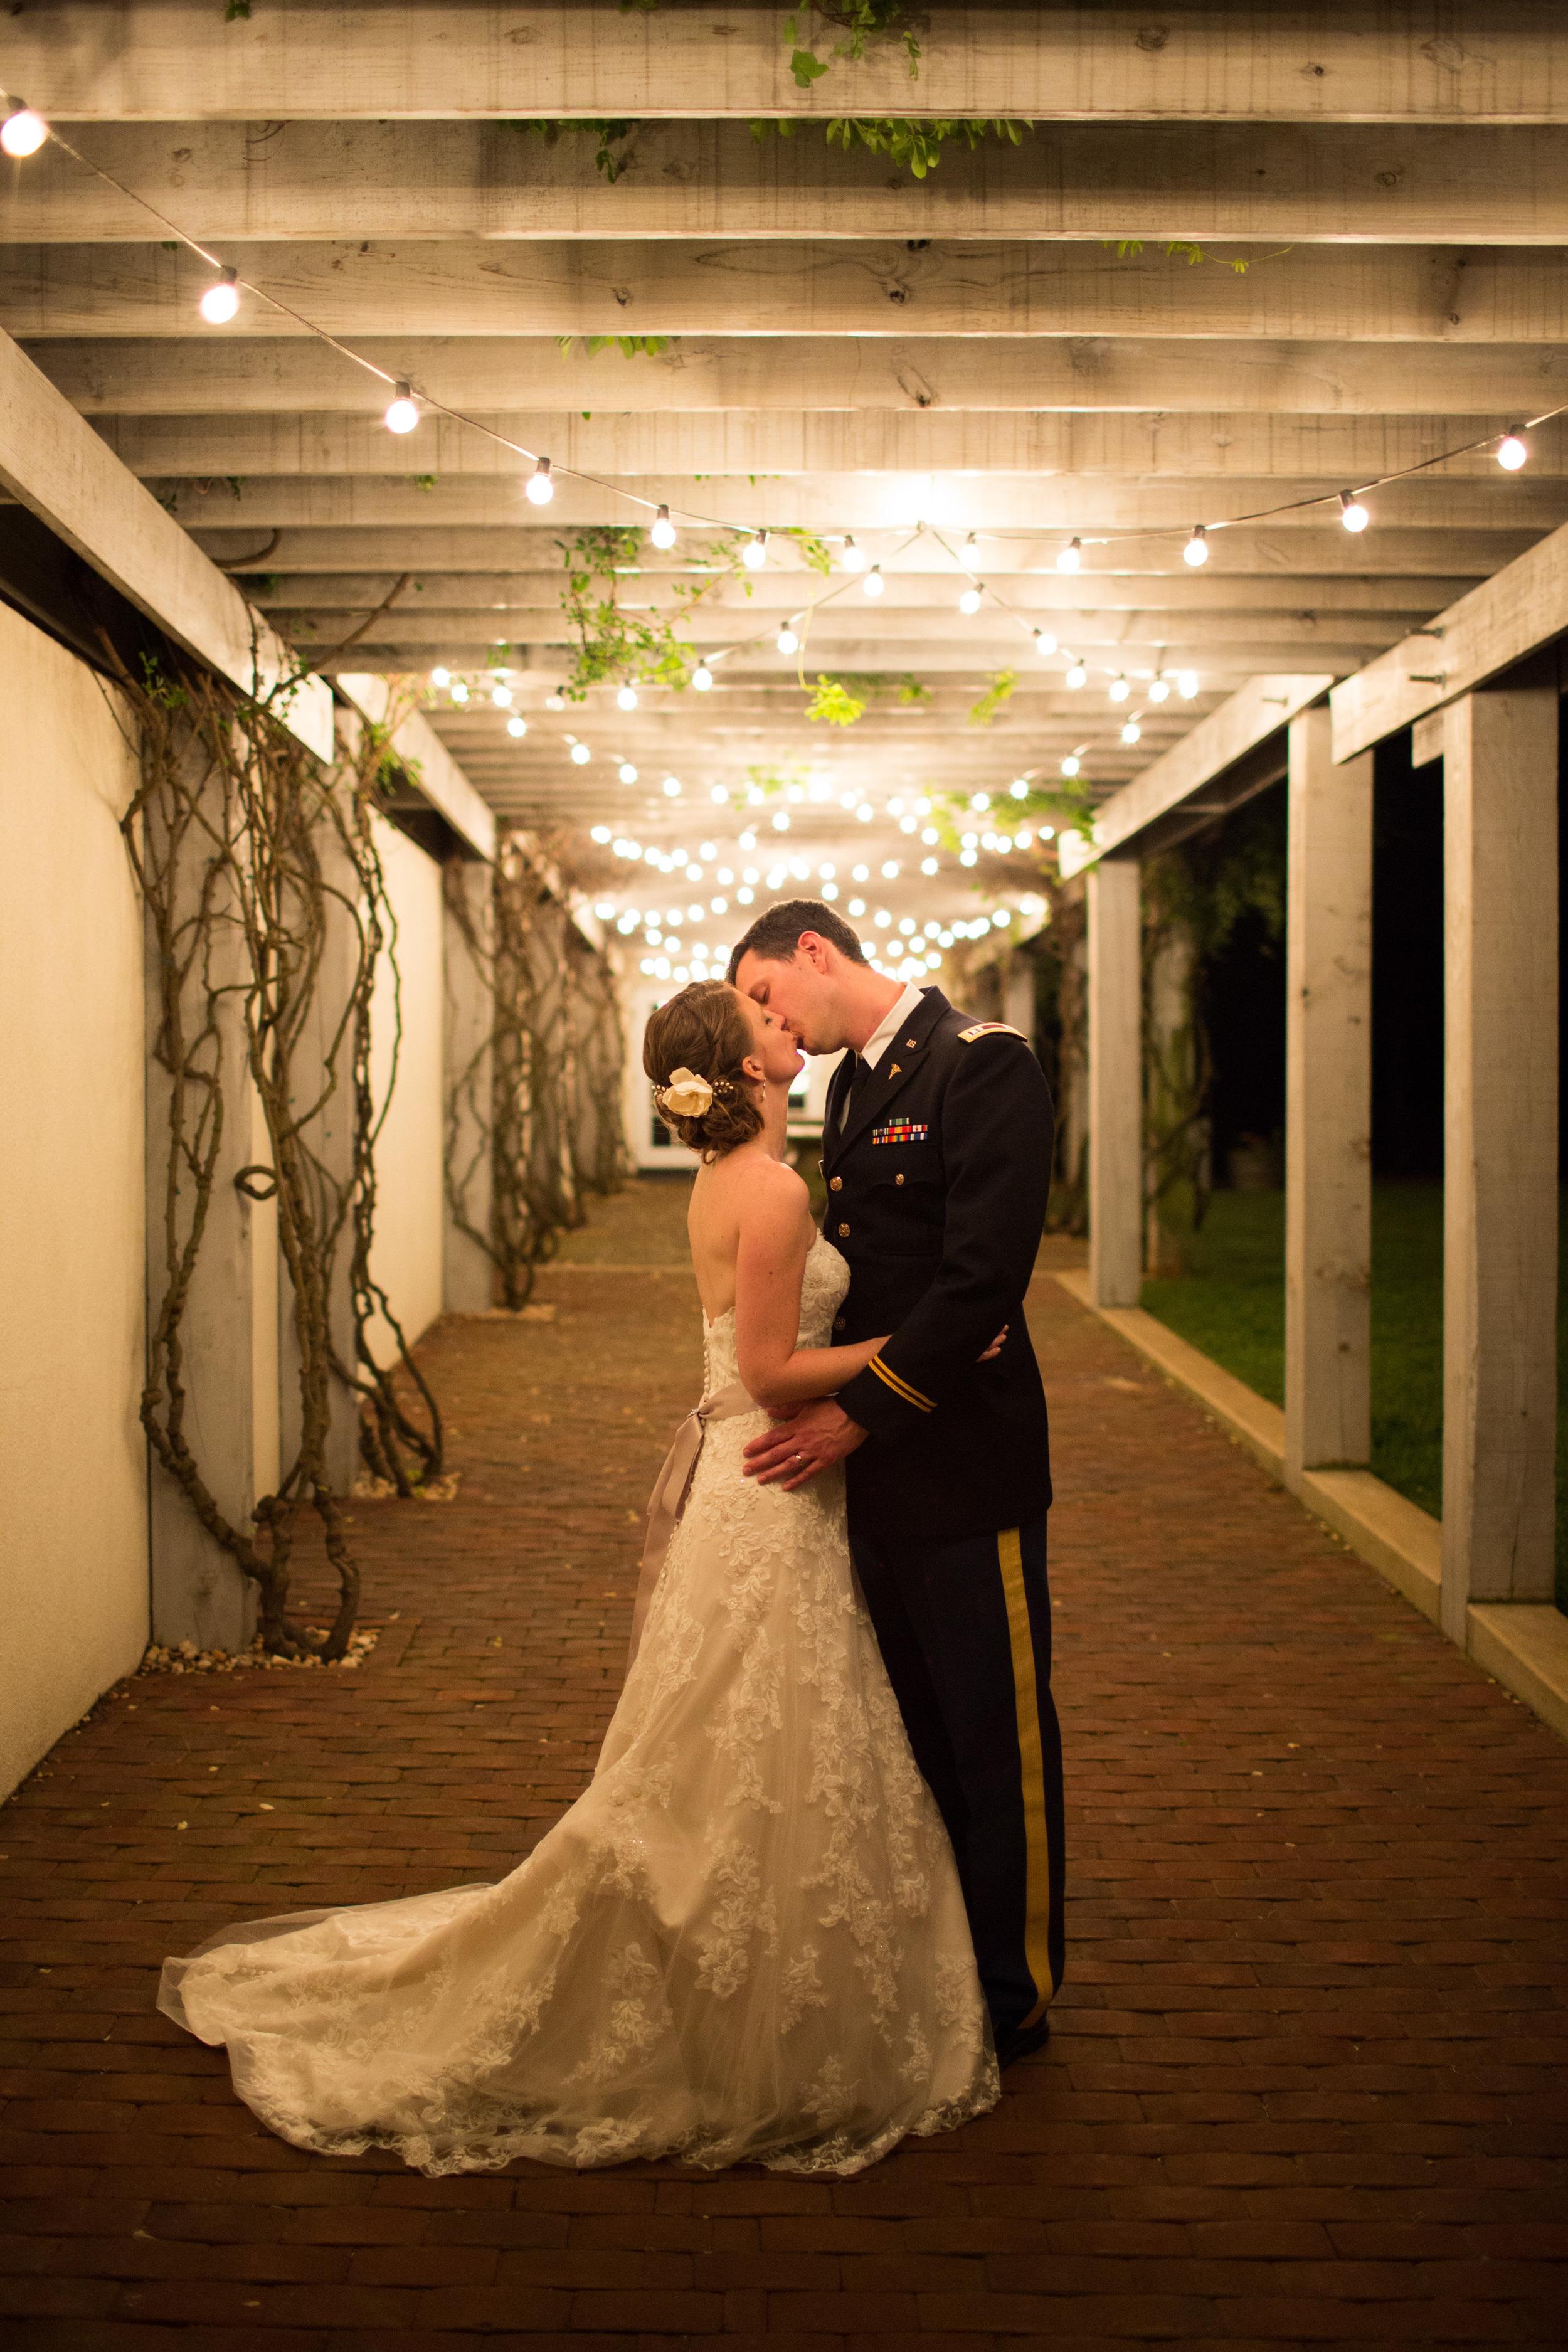 Jen + Jim on May 24, 2015 ♥ Aaron Watson Photography at King Family Vineyards (Crozet, VA)